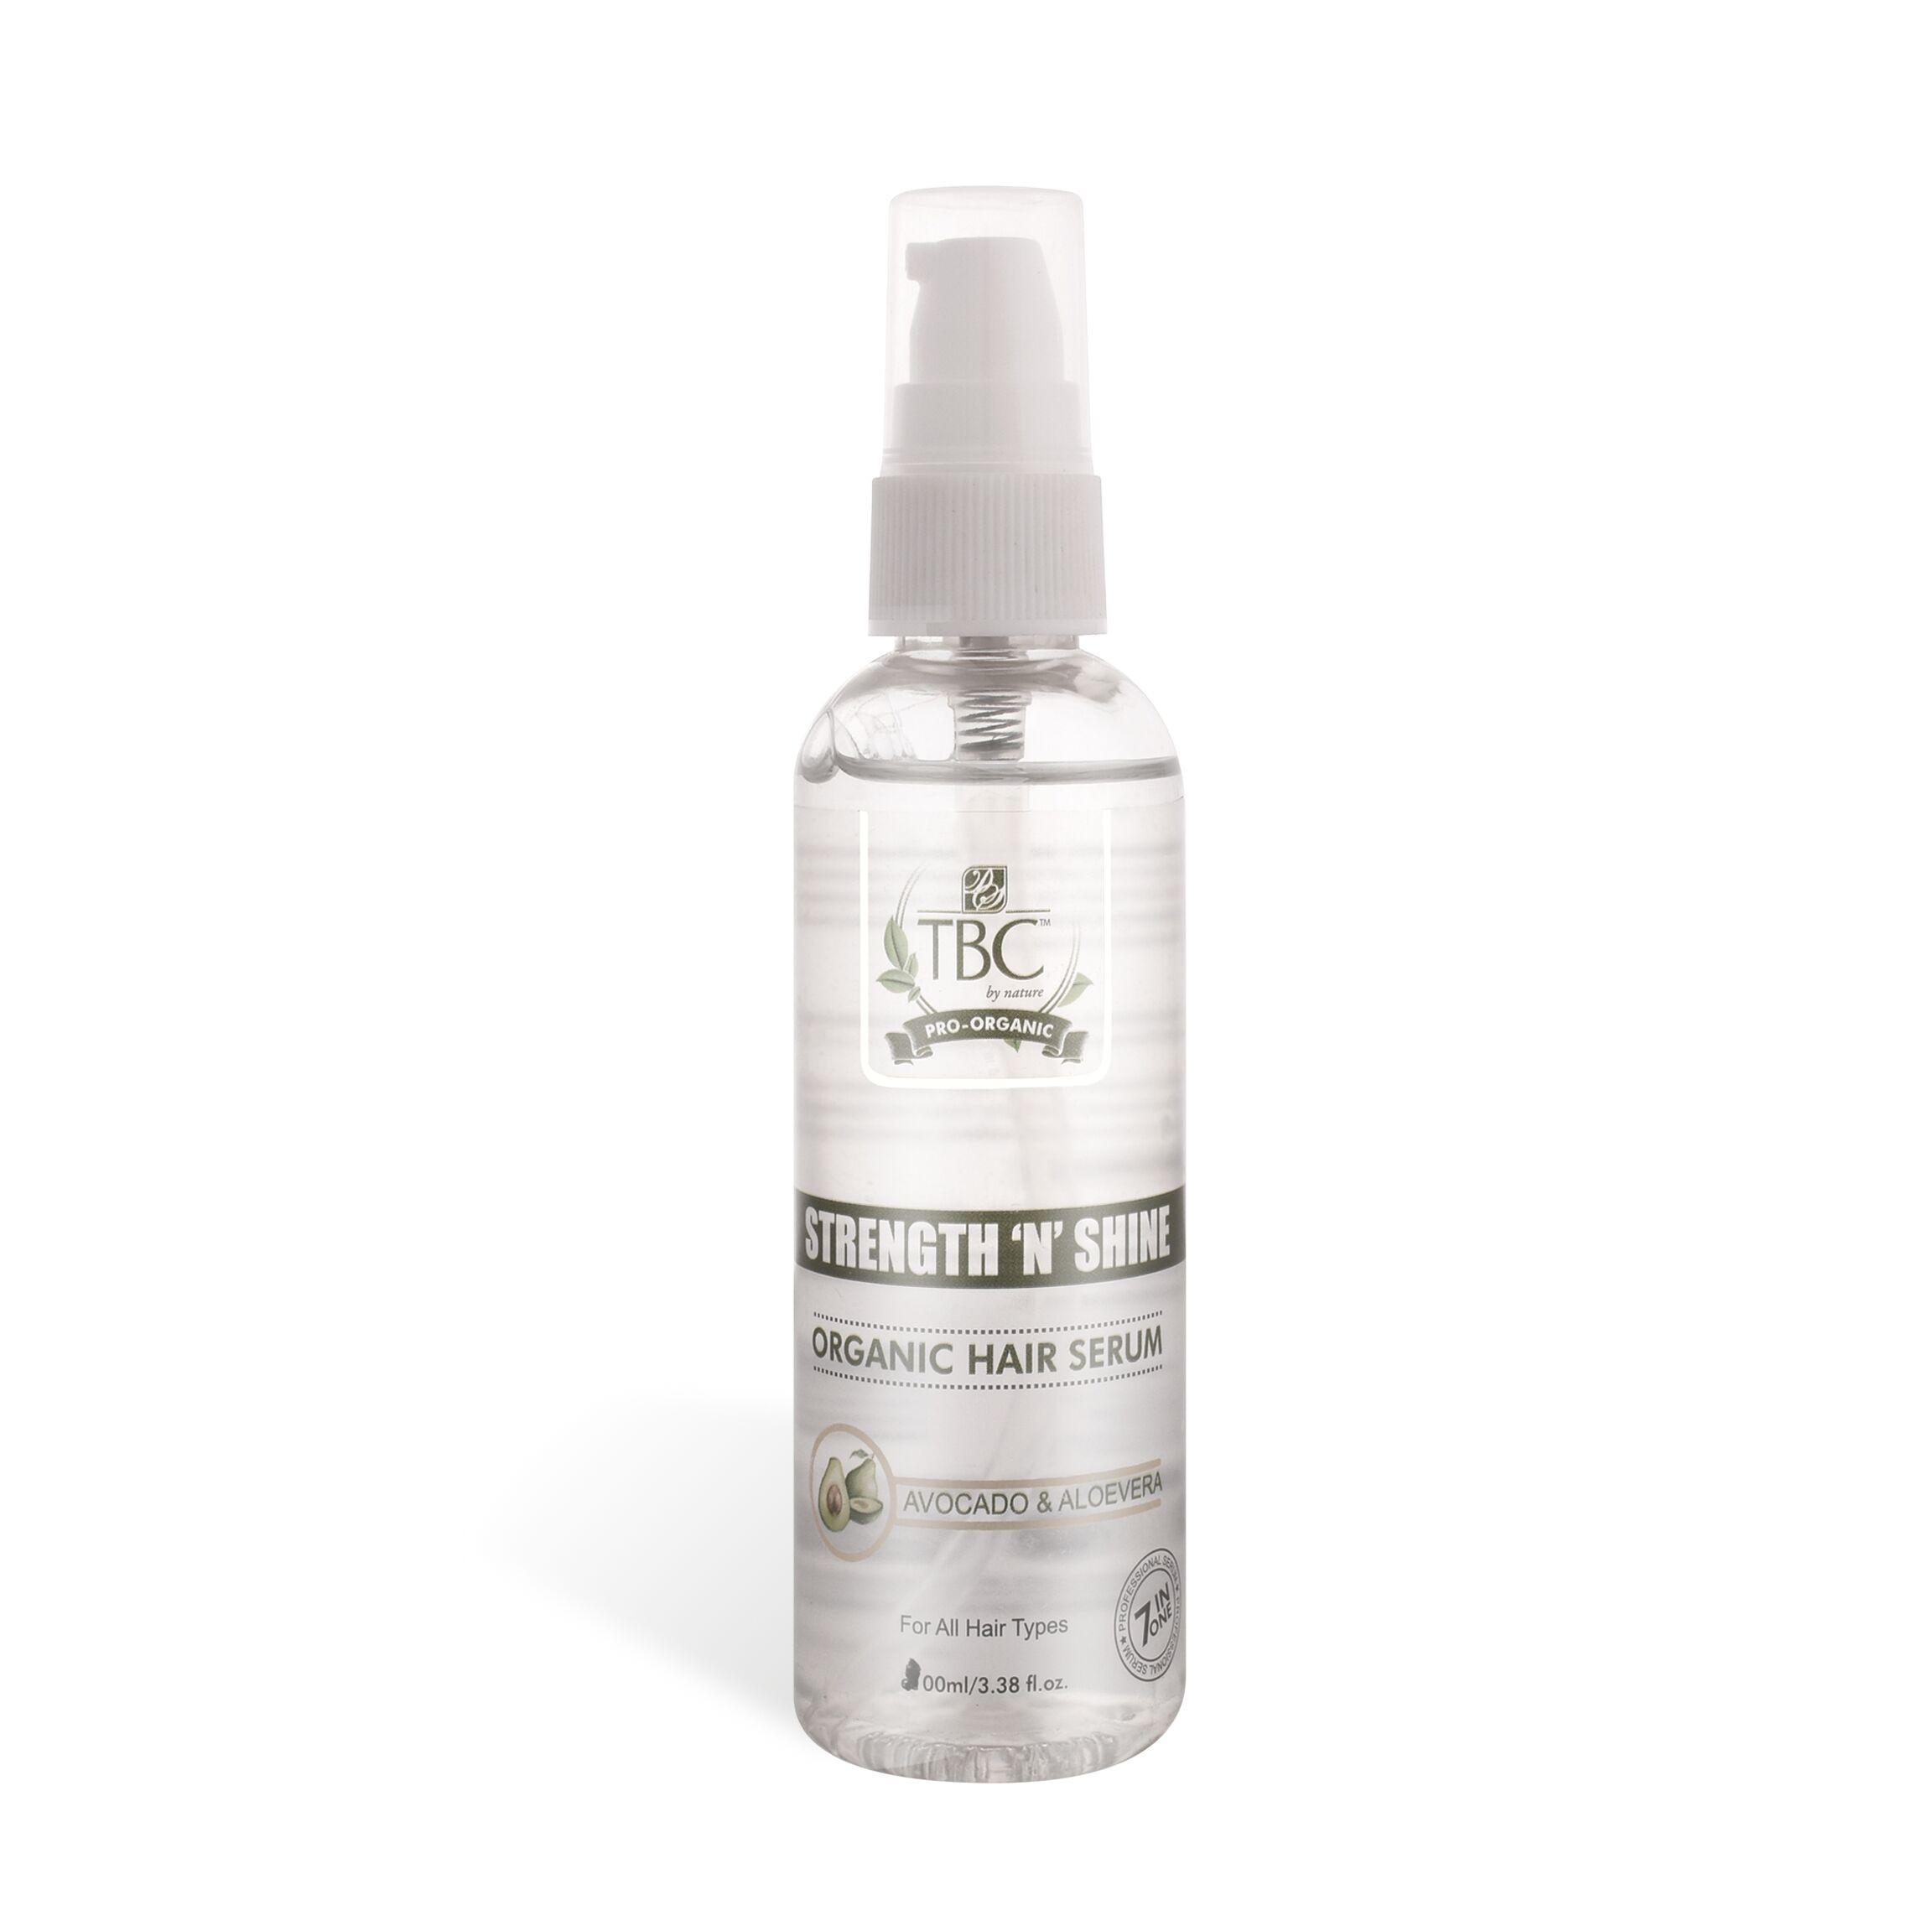 TBC Pro Strength N Shine Organic Hair Serum 100ml